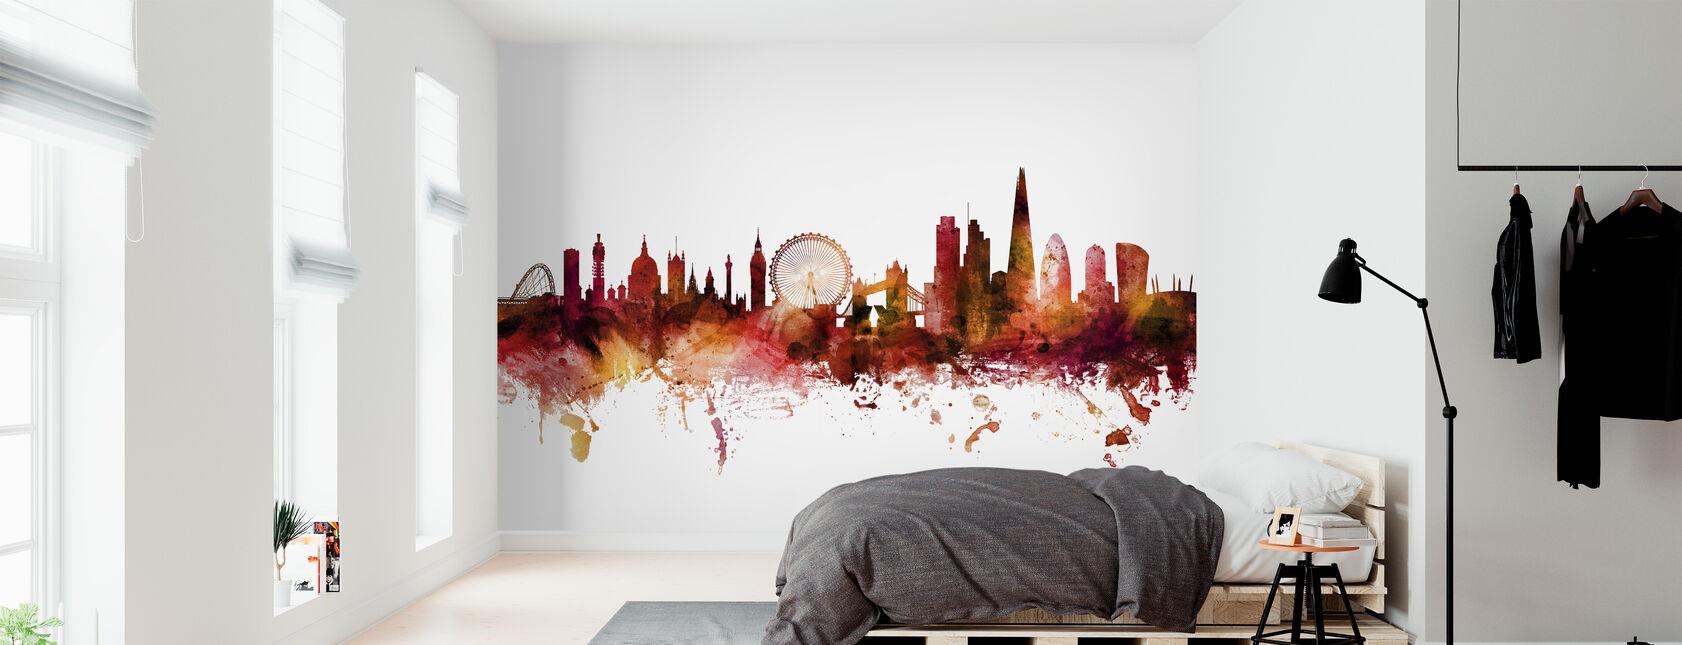 London England Skyline - Wallpaper - Bedroom